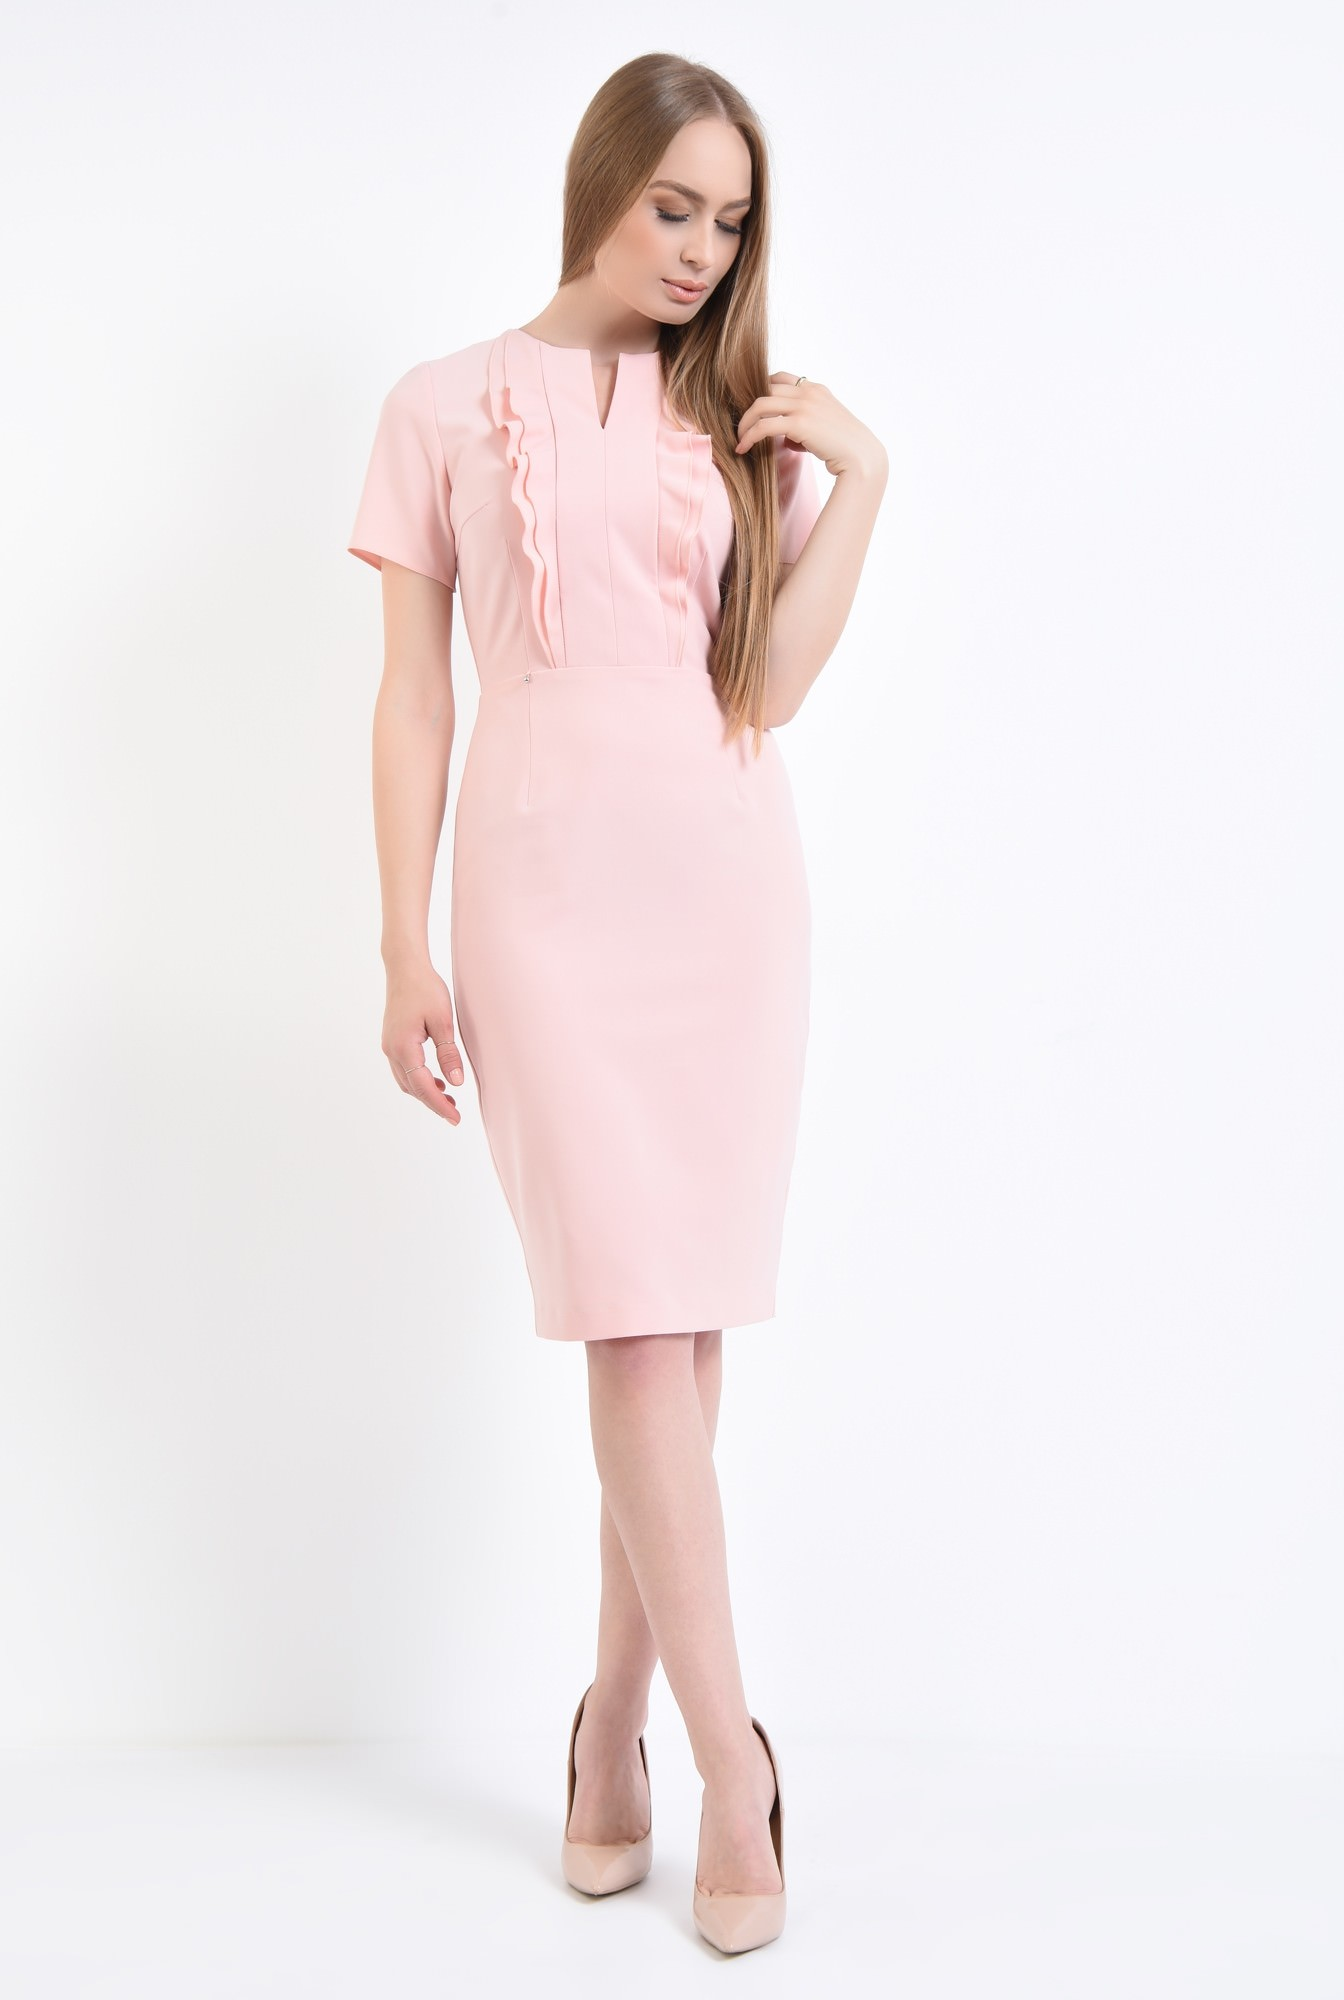 3 - Rochie conica, roz